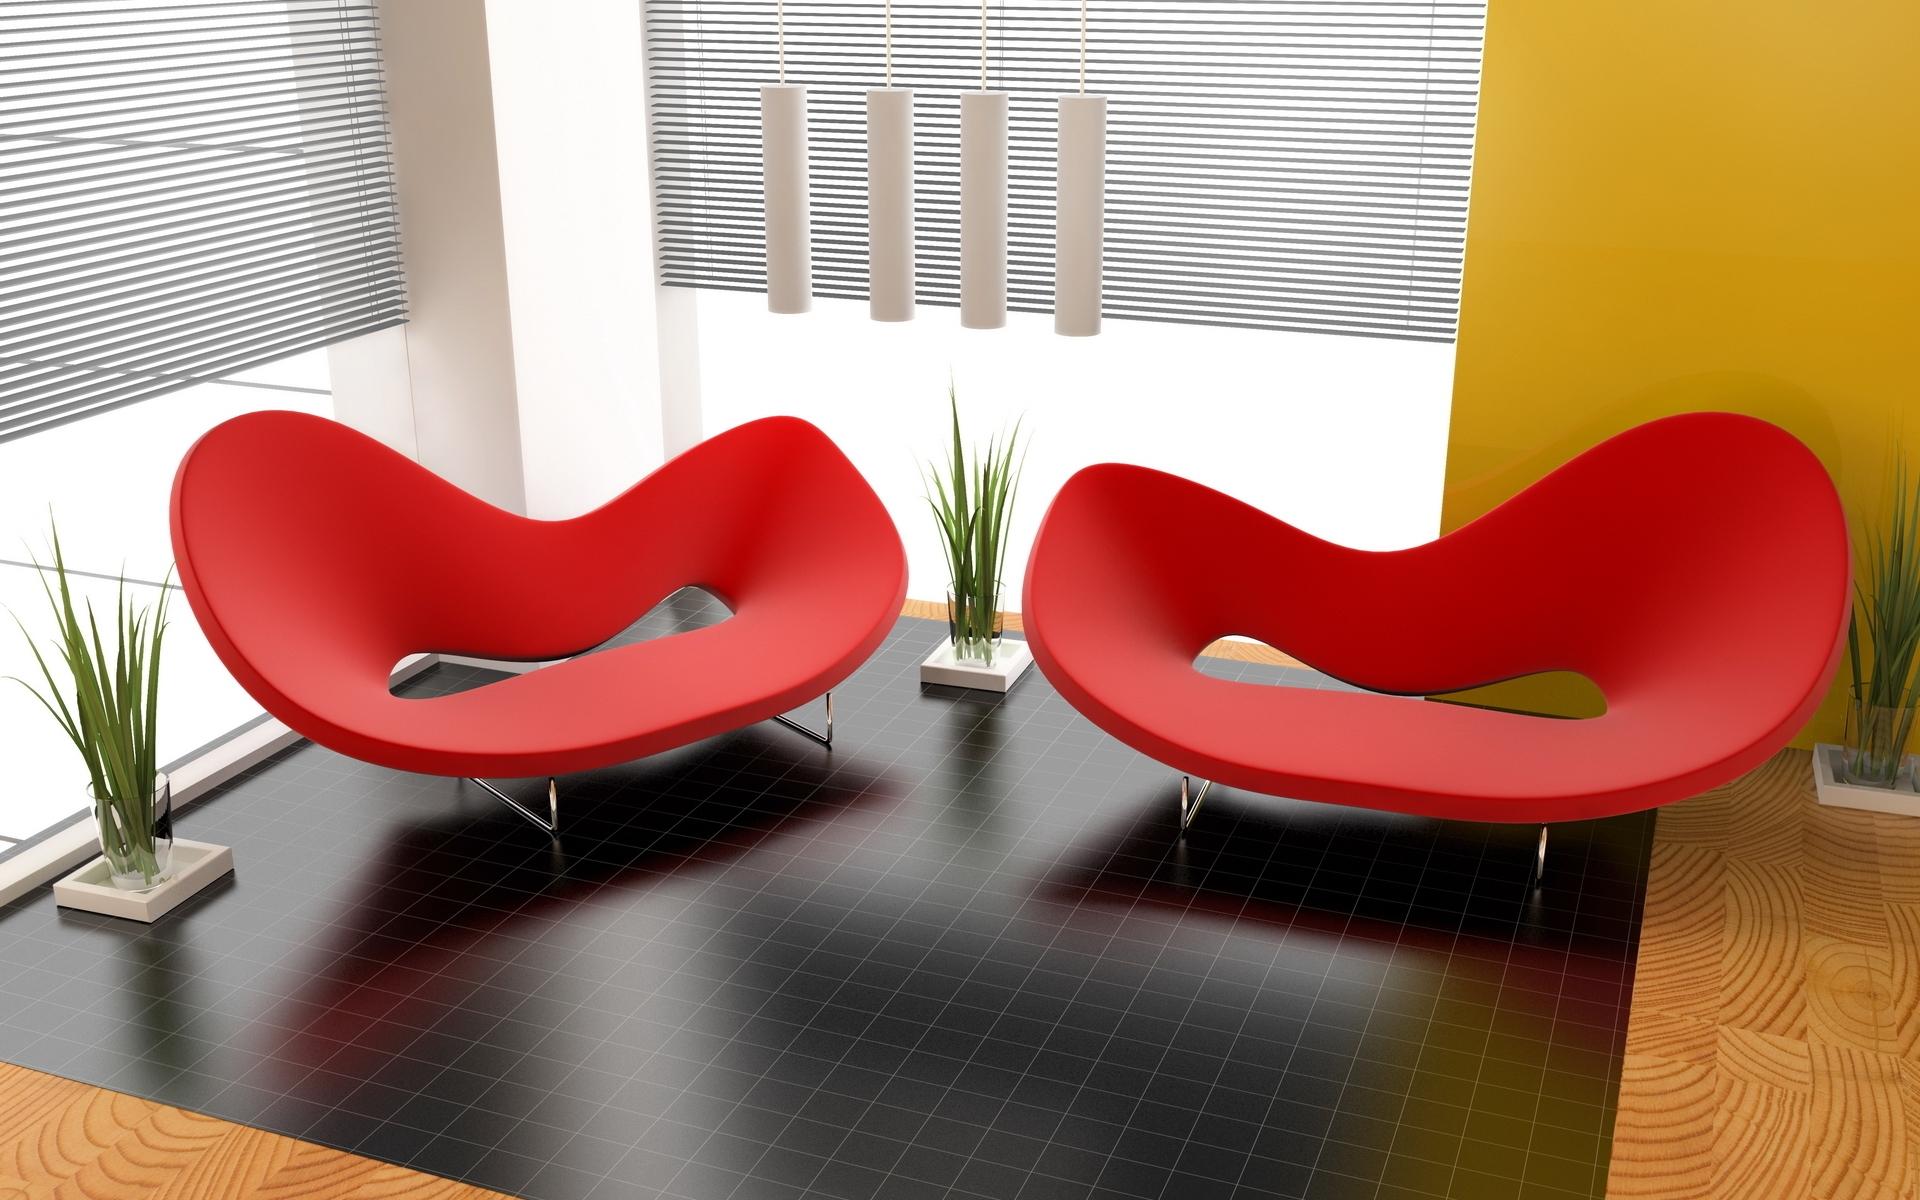 Wallpaper plants table interior design color form style